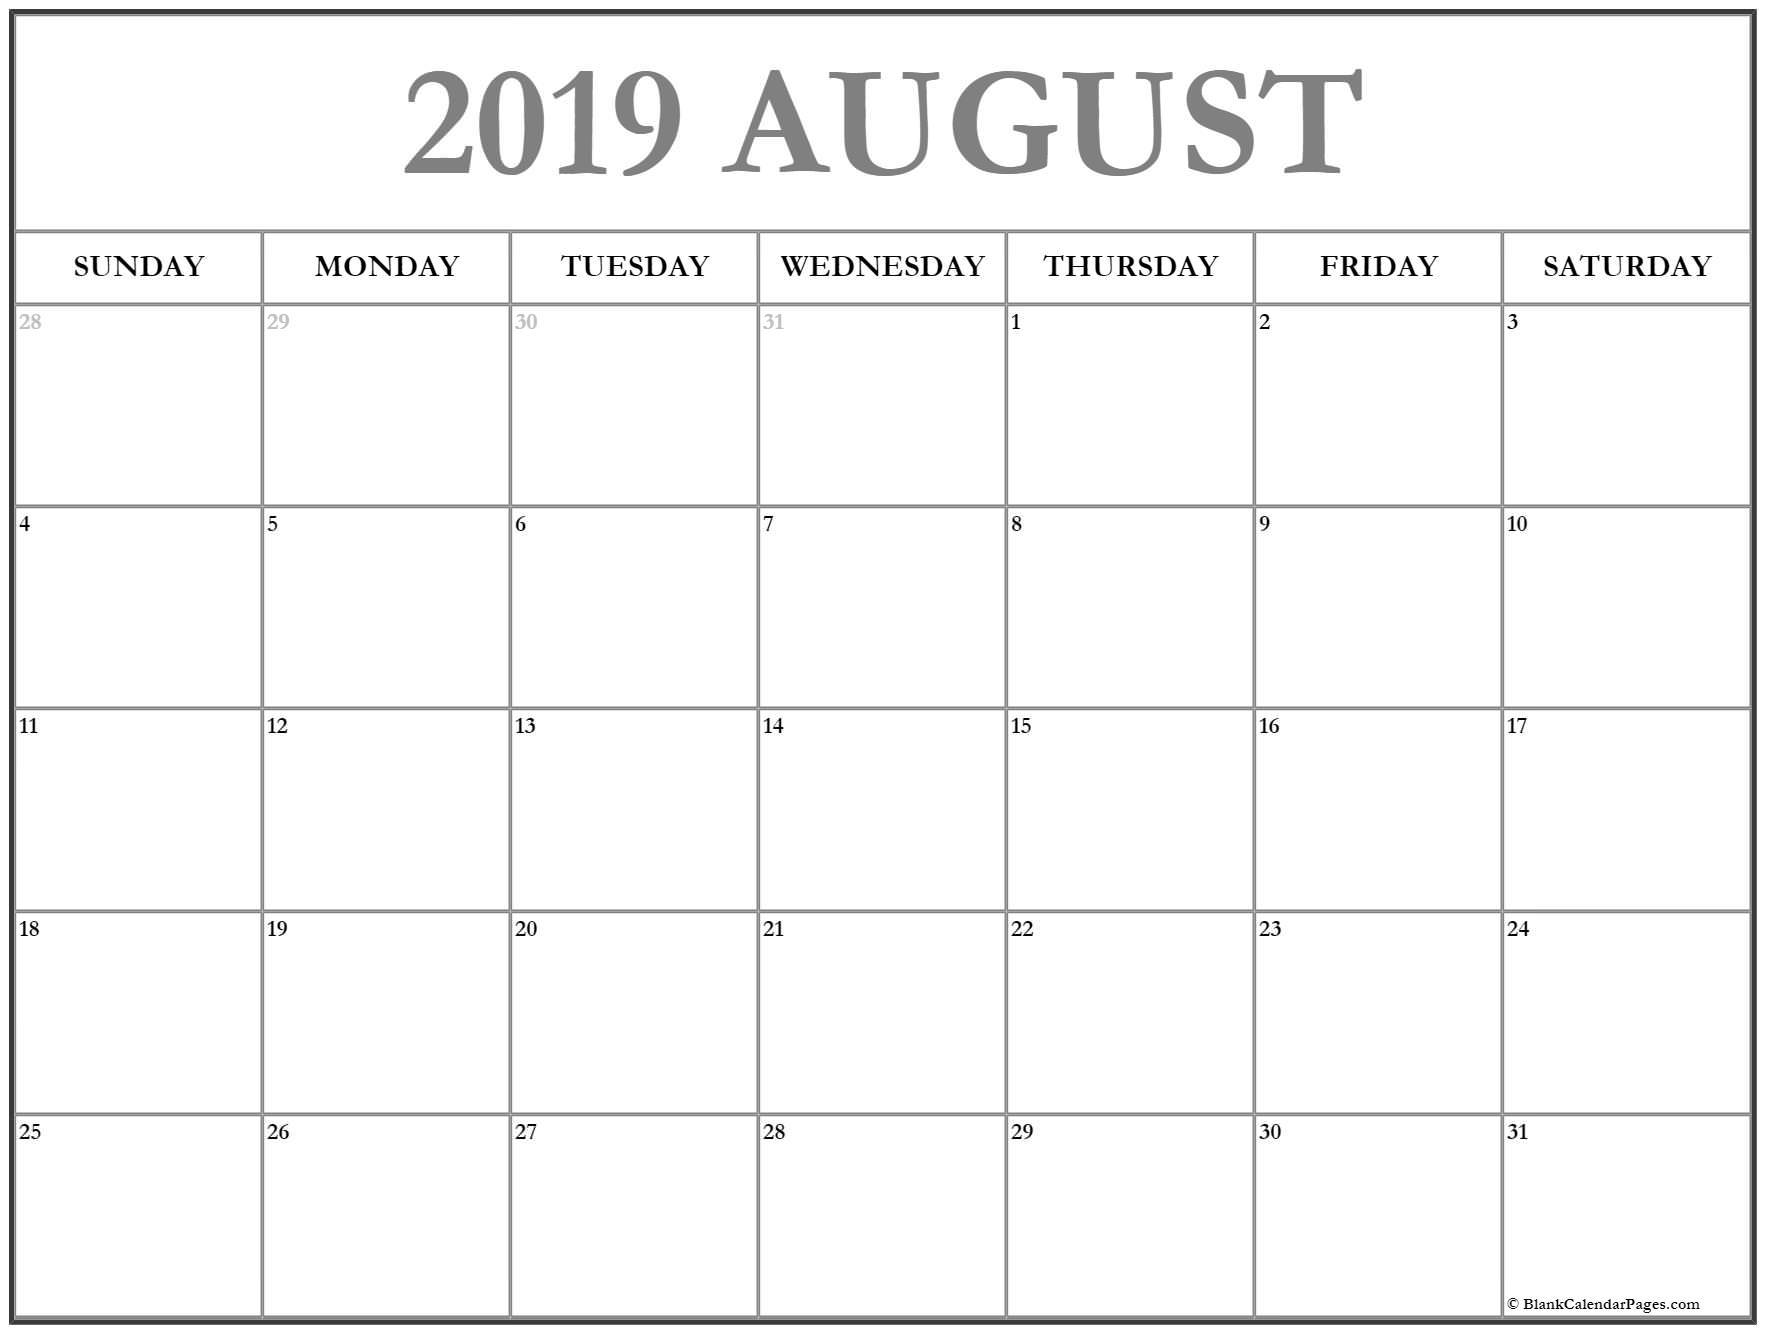 August 2019 Calendar | Free Printable Monthly Calendars with regard to Calendar Blanks August Through October 2019